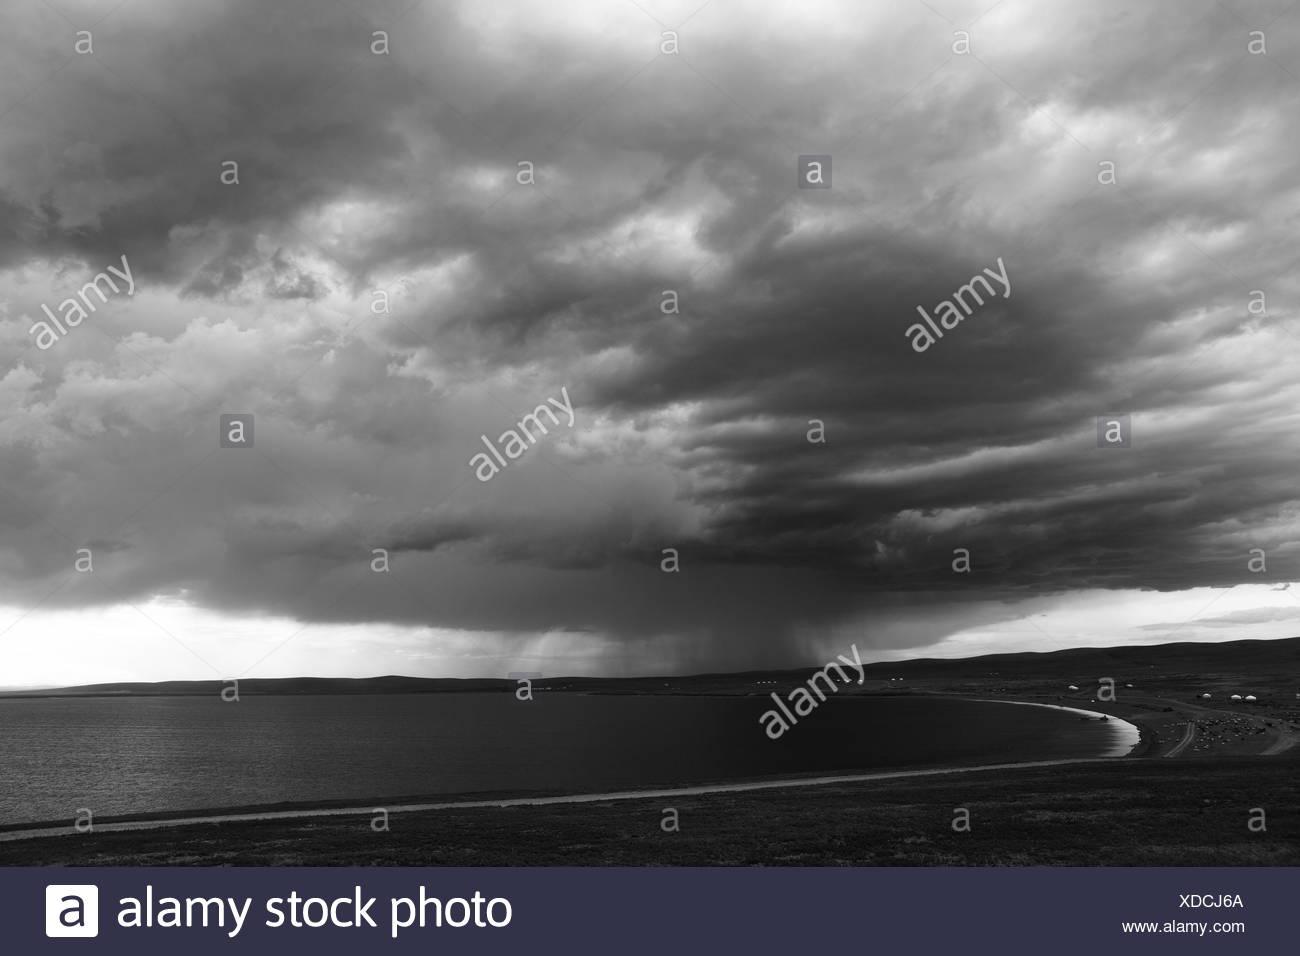 rain over the lake ogii mongolia - Stock Image